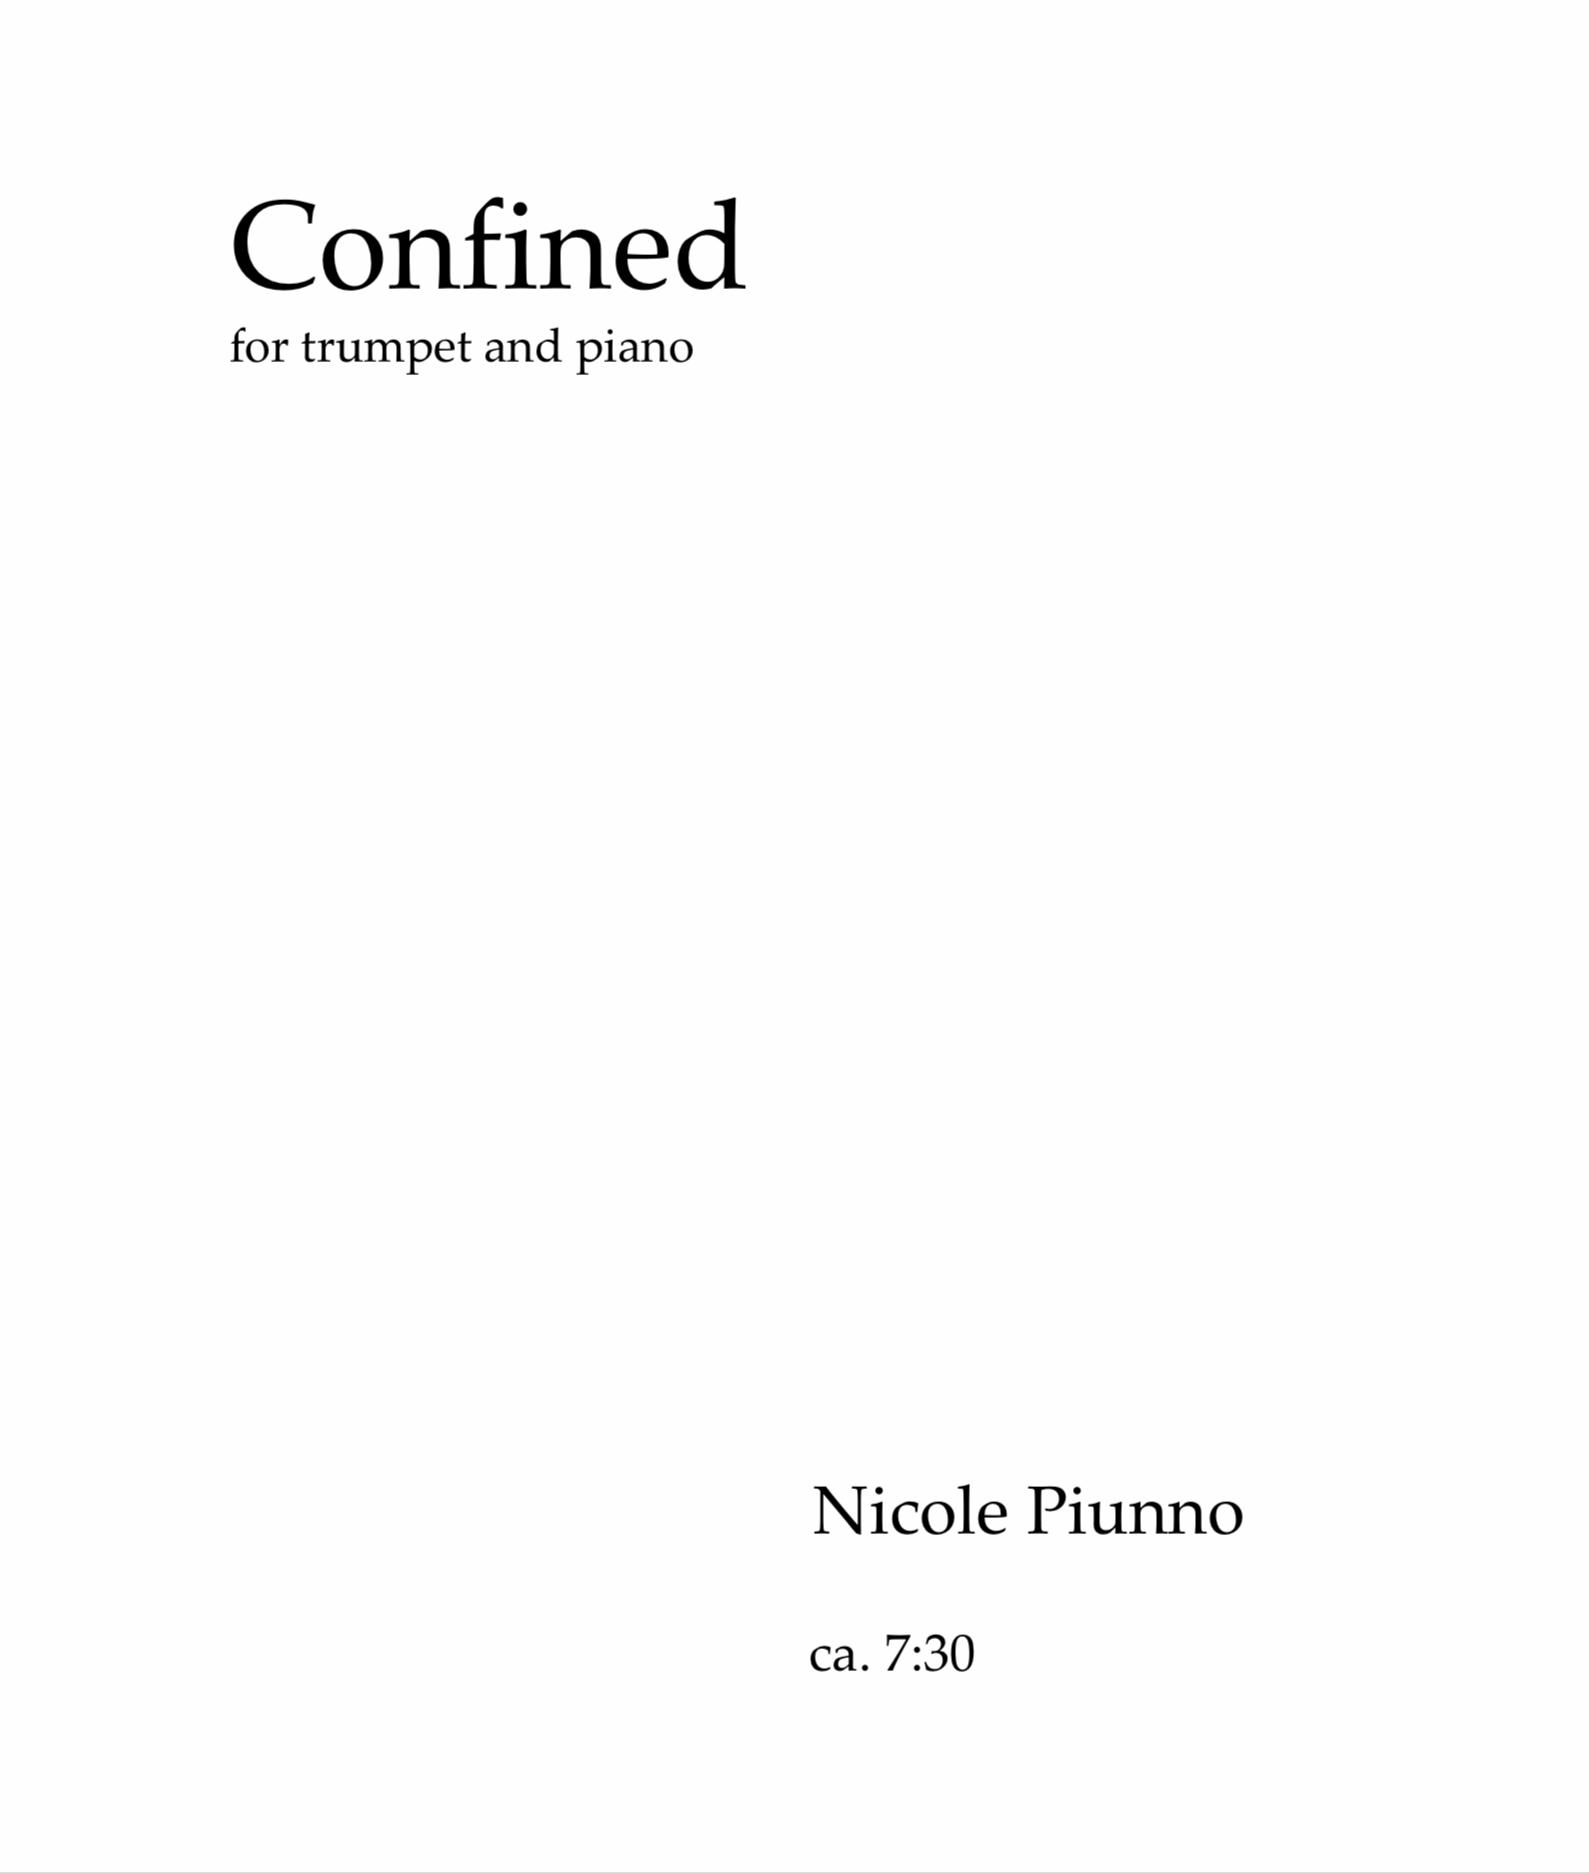 Confined by Nicole Piunno